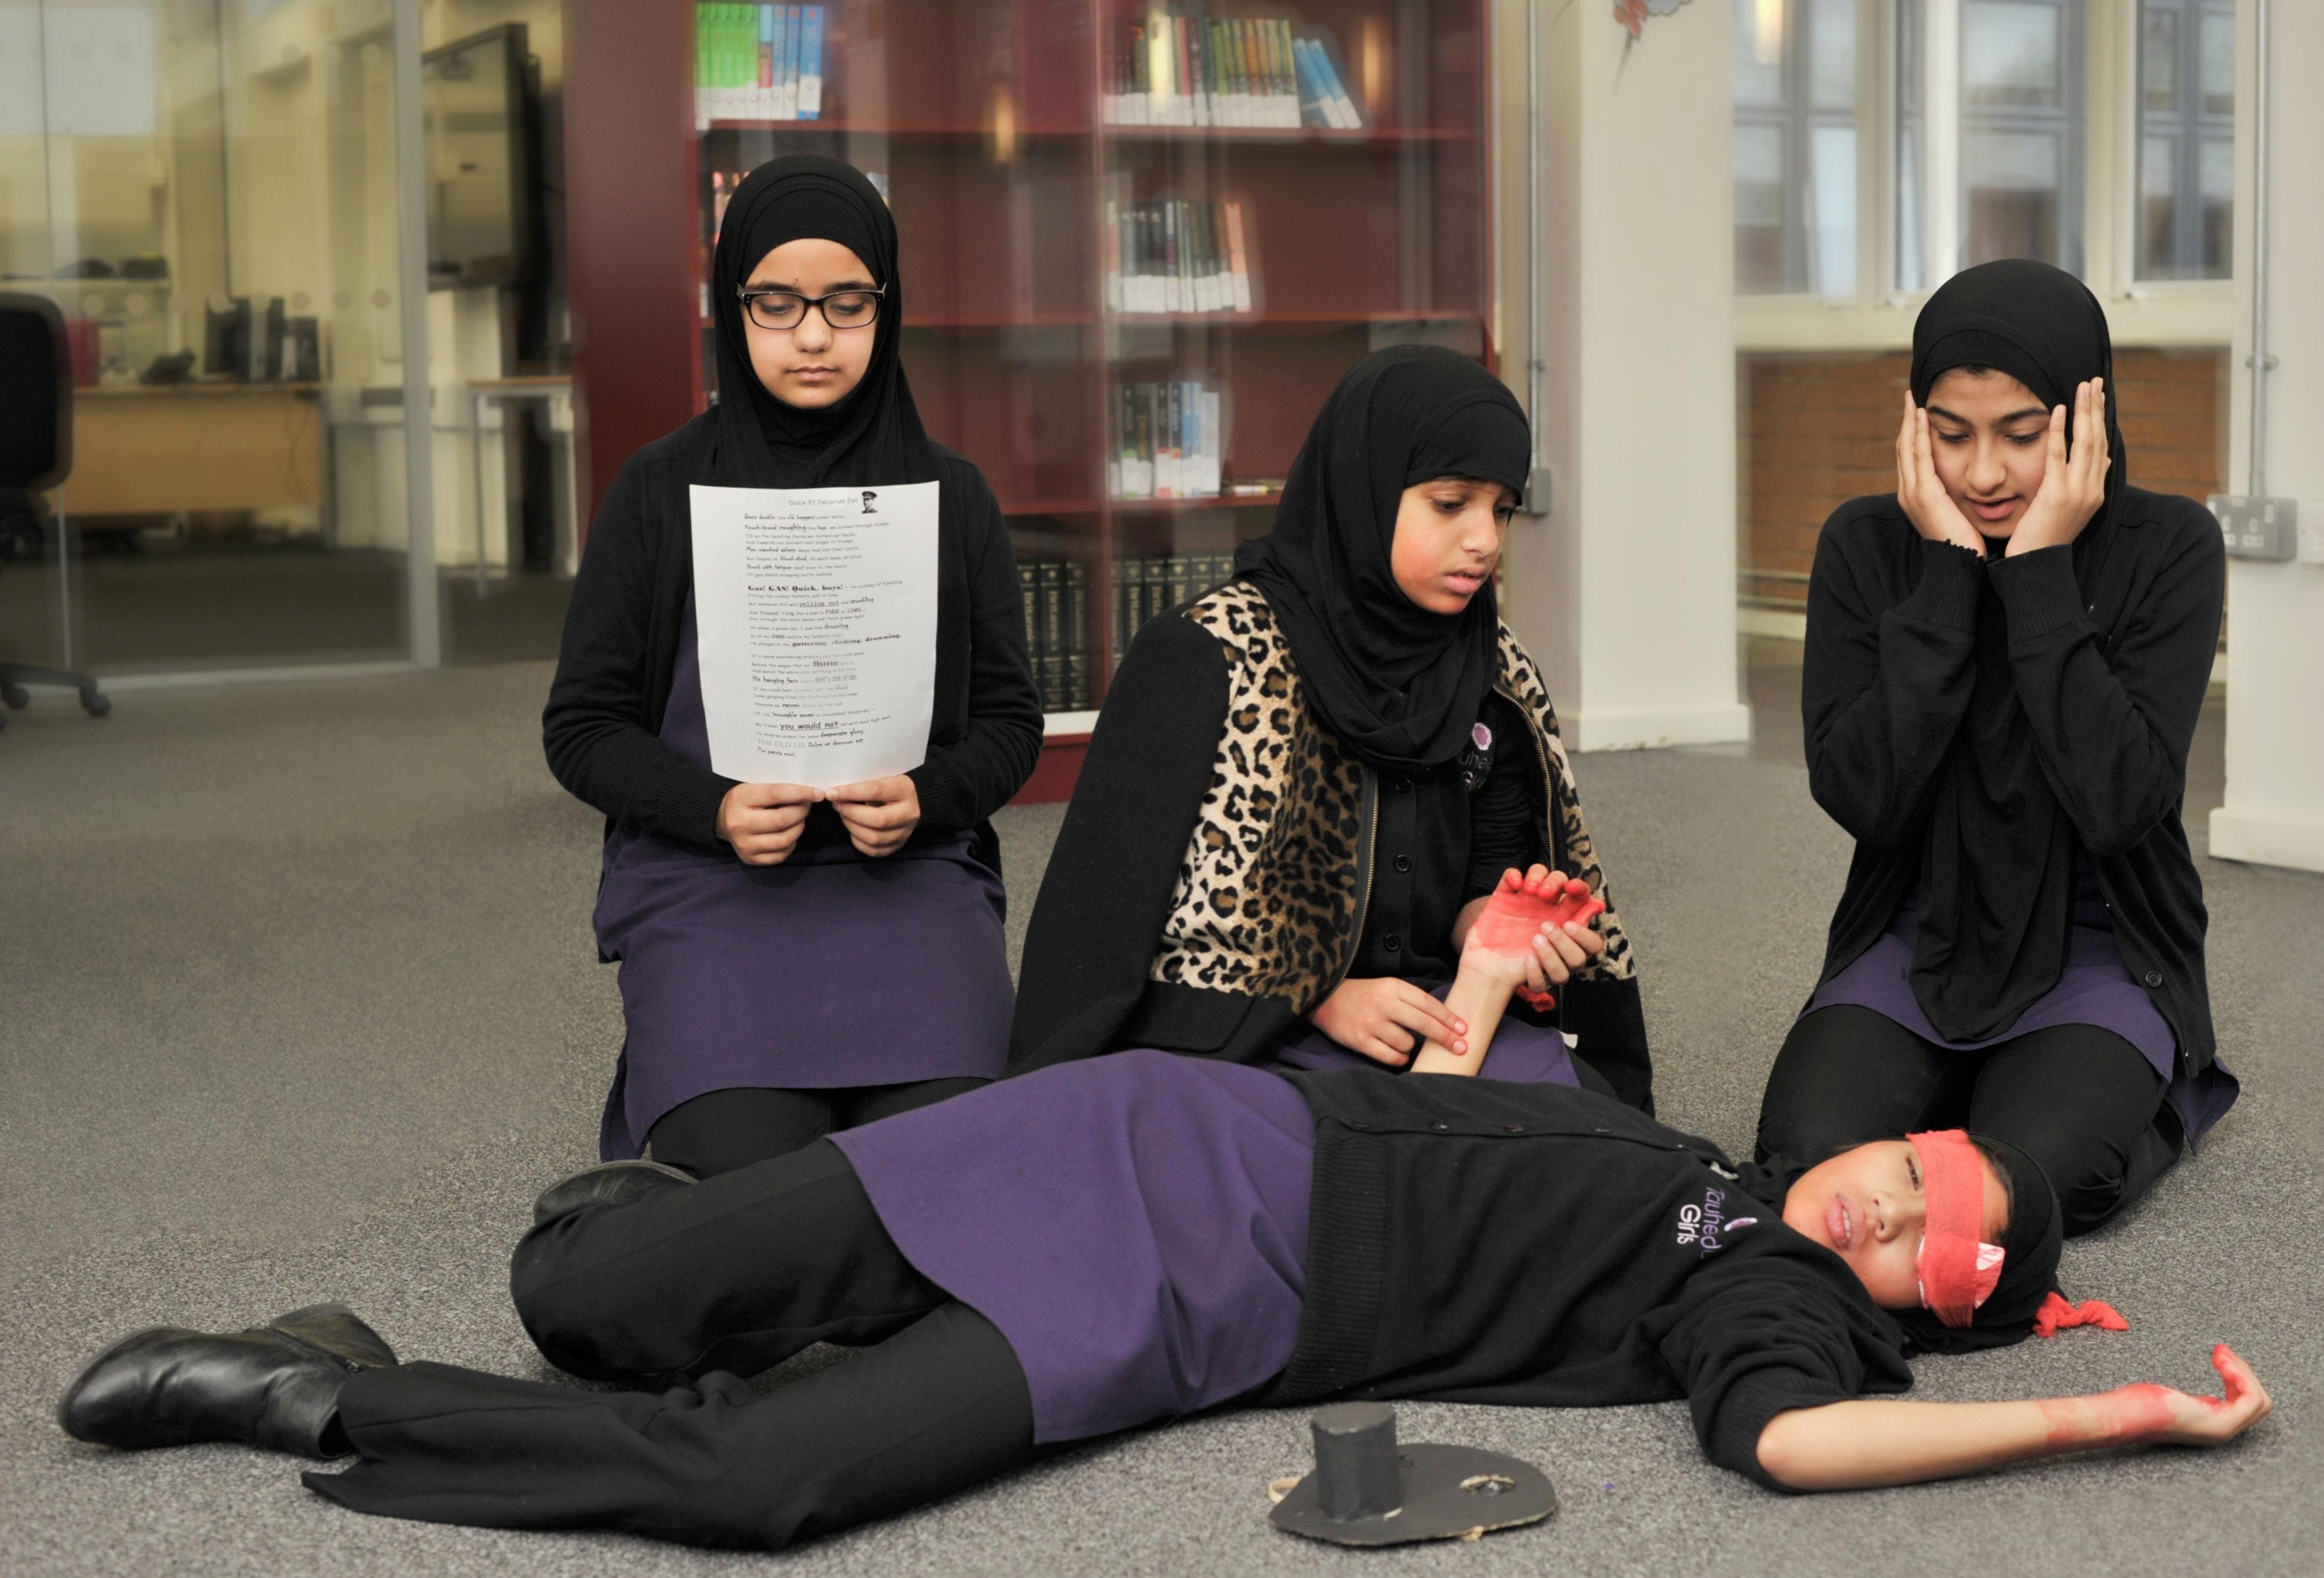 Исламские картинки с одноклассников на компьютер